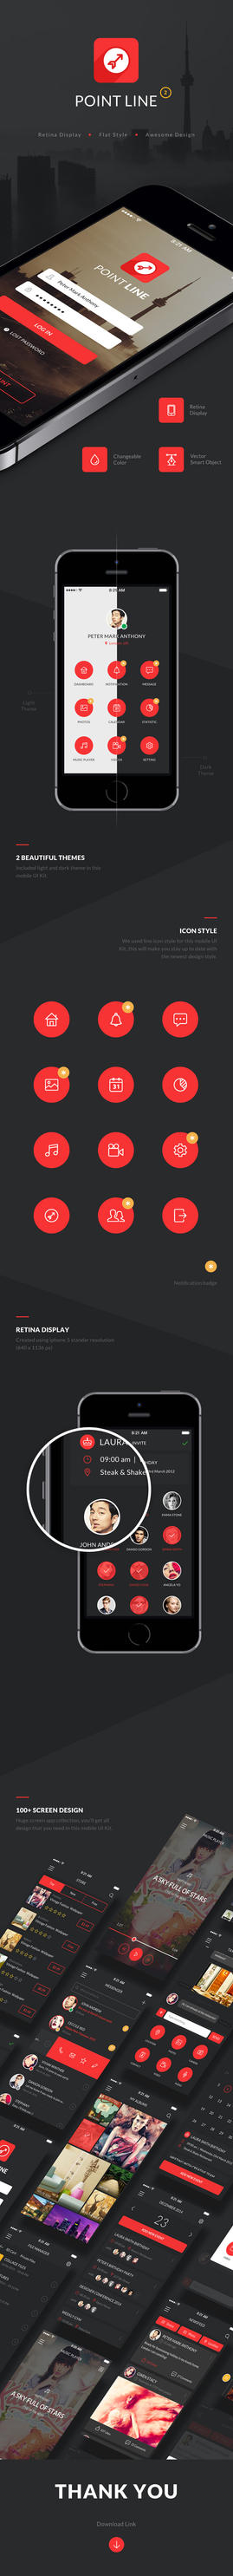 Point Flat Mobile App UI Kit by diekave